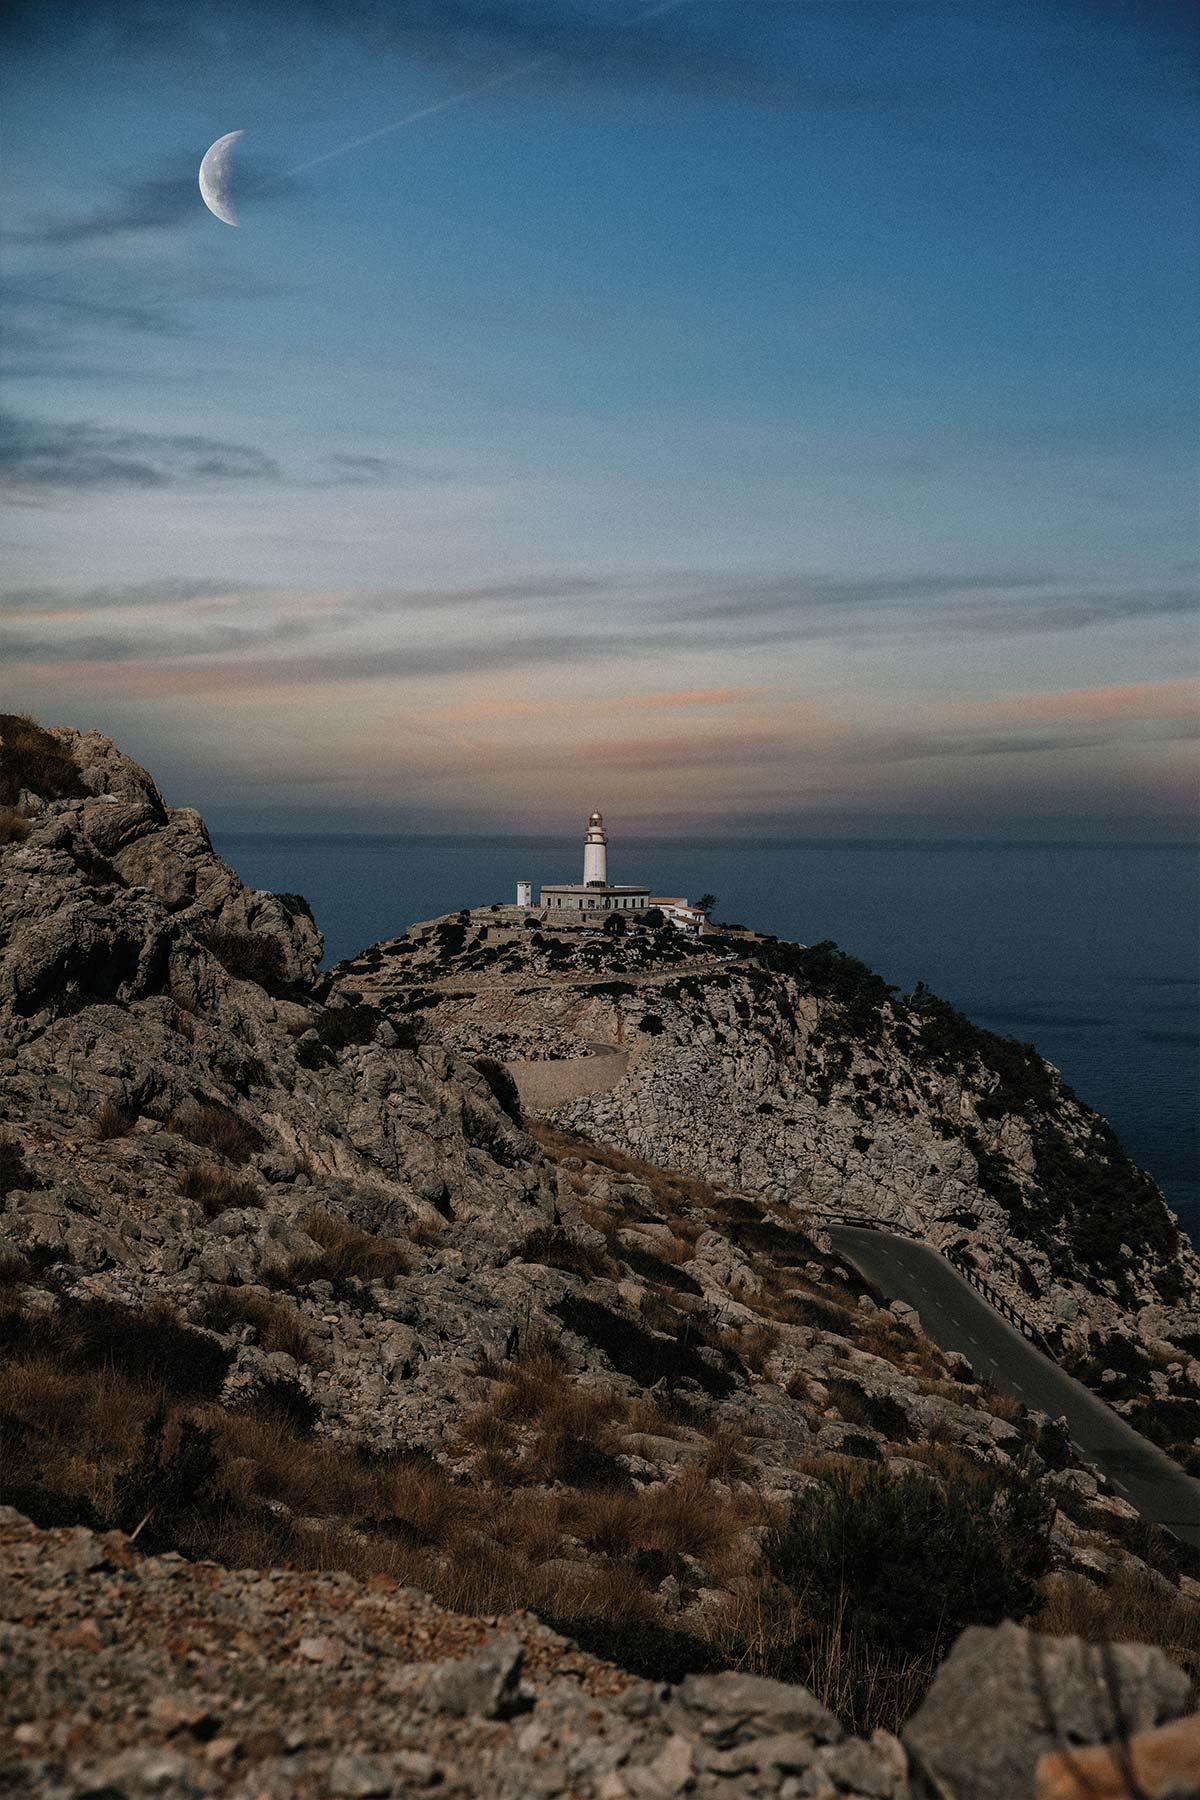 Travel-Photography-Bildreportage-Mallorca-Spain-Vacation-Basti-Kaspar_moon-night-lighthouse